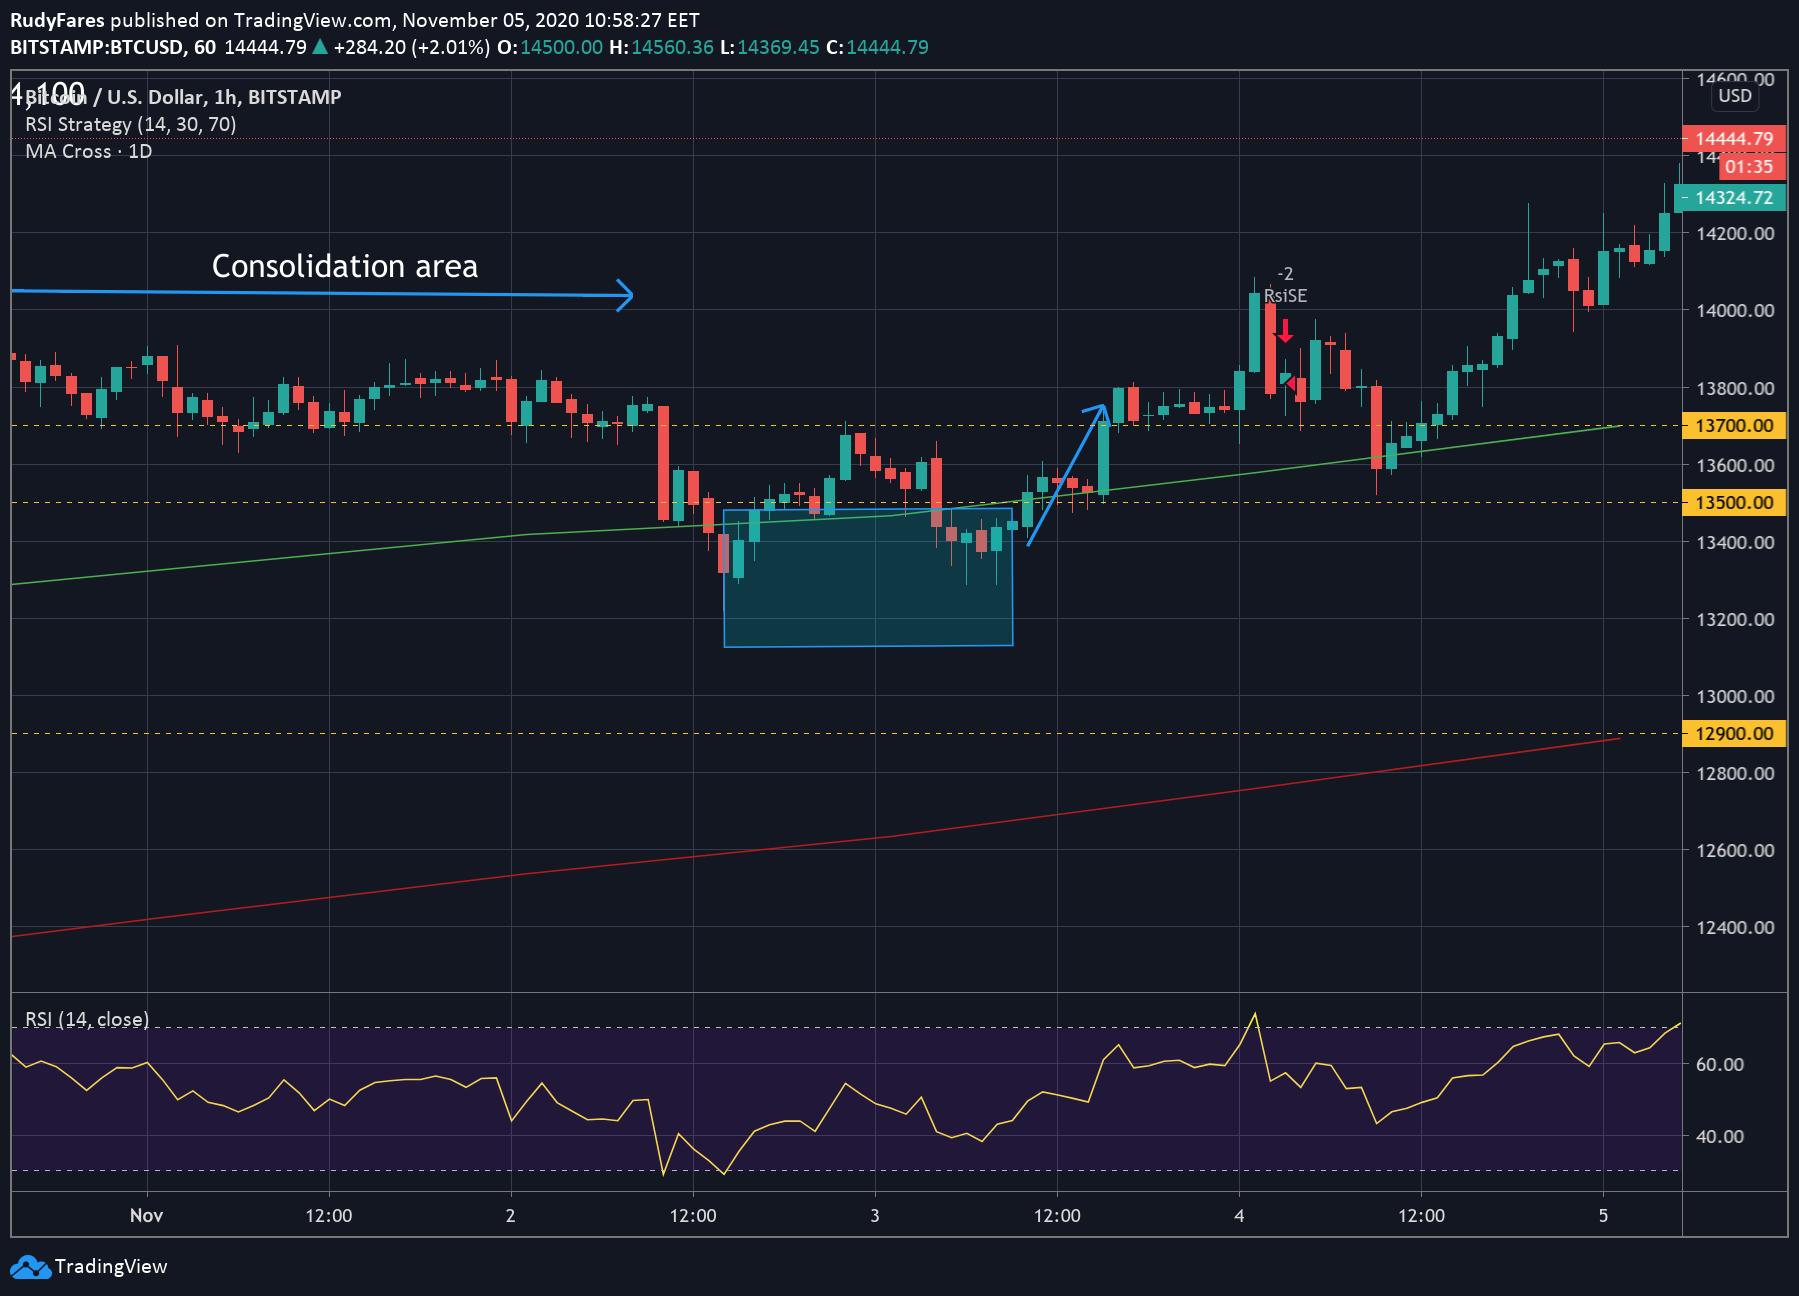 BTC/USD price 1H chart, past prediction